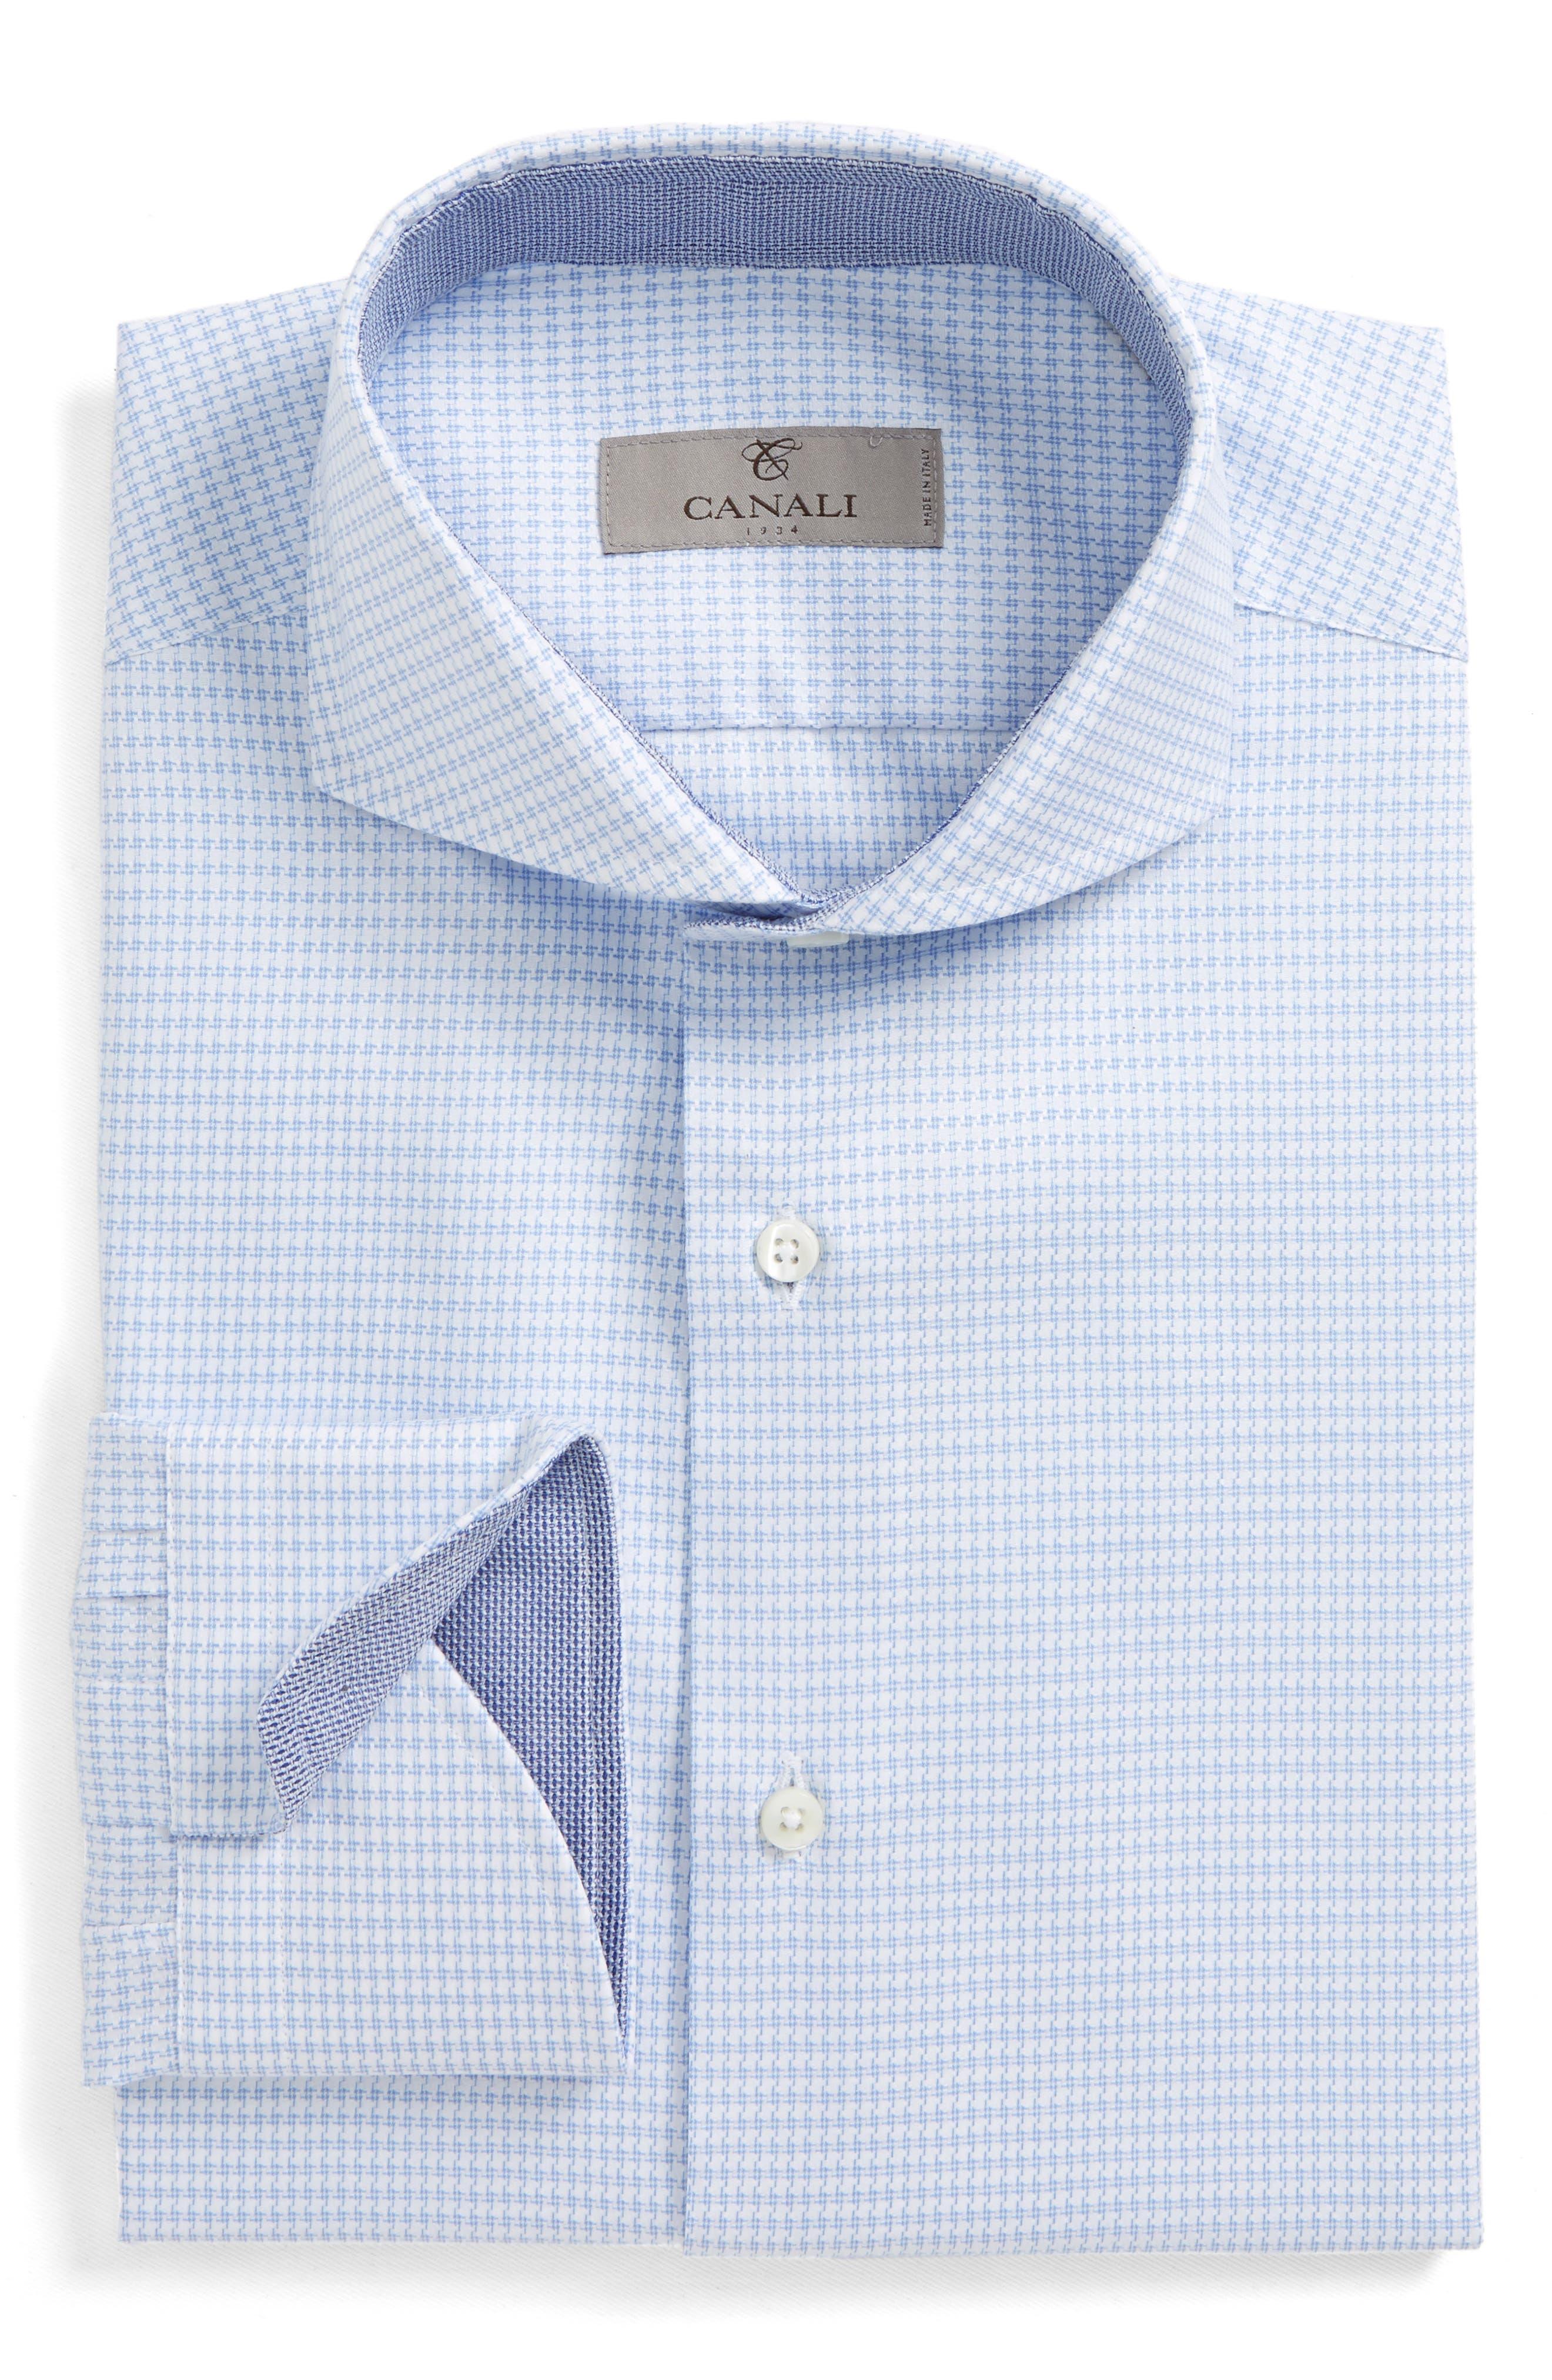 Regular Fit Houndstooth Dress Shirt,                             Main thumbnail 1, color,                             Light Blue